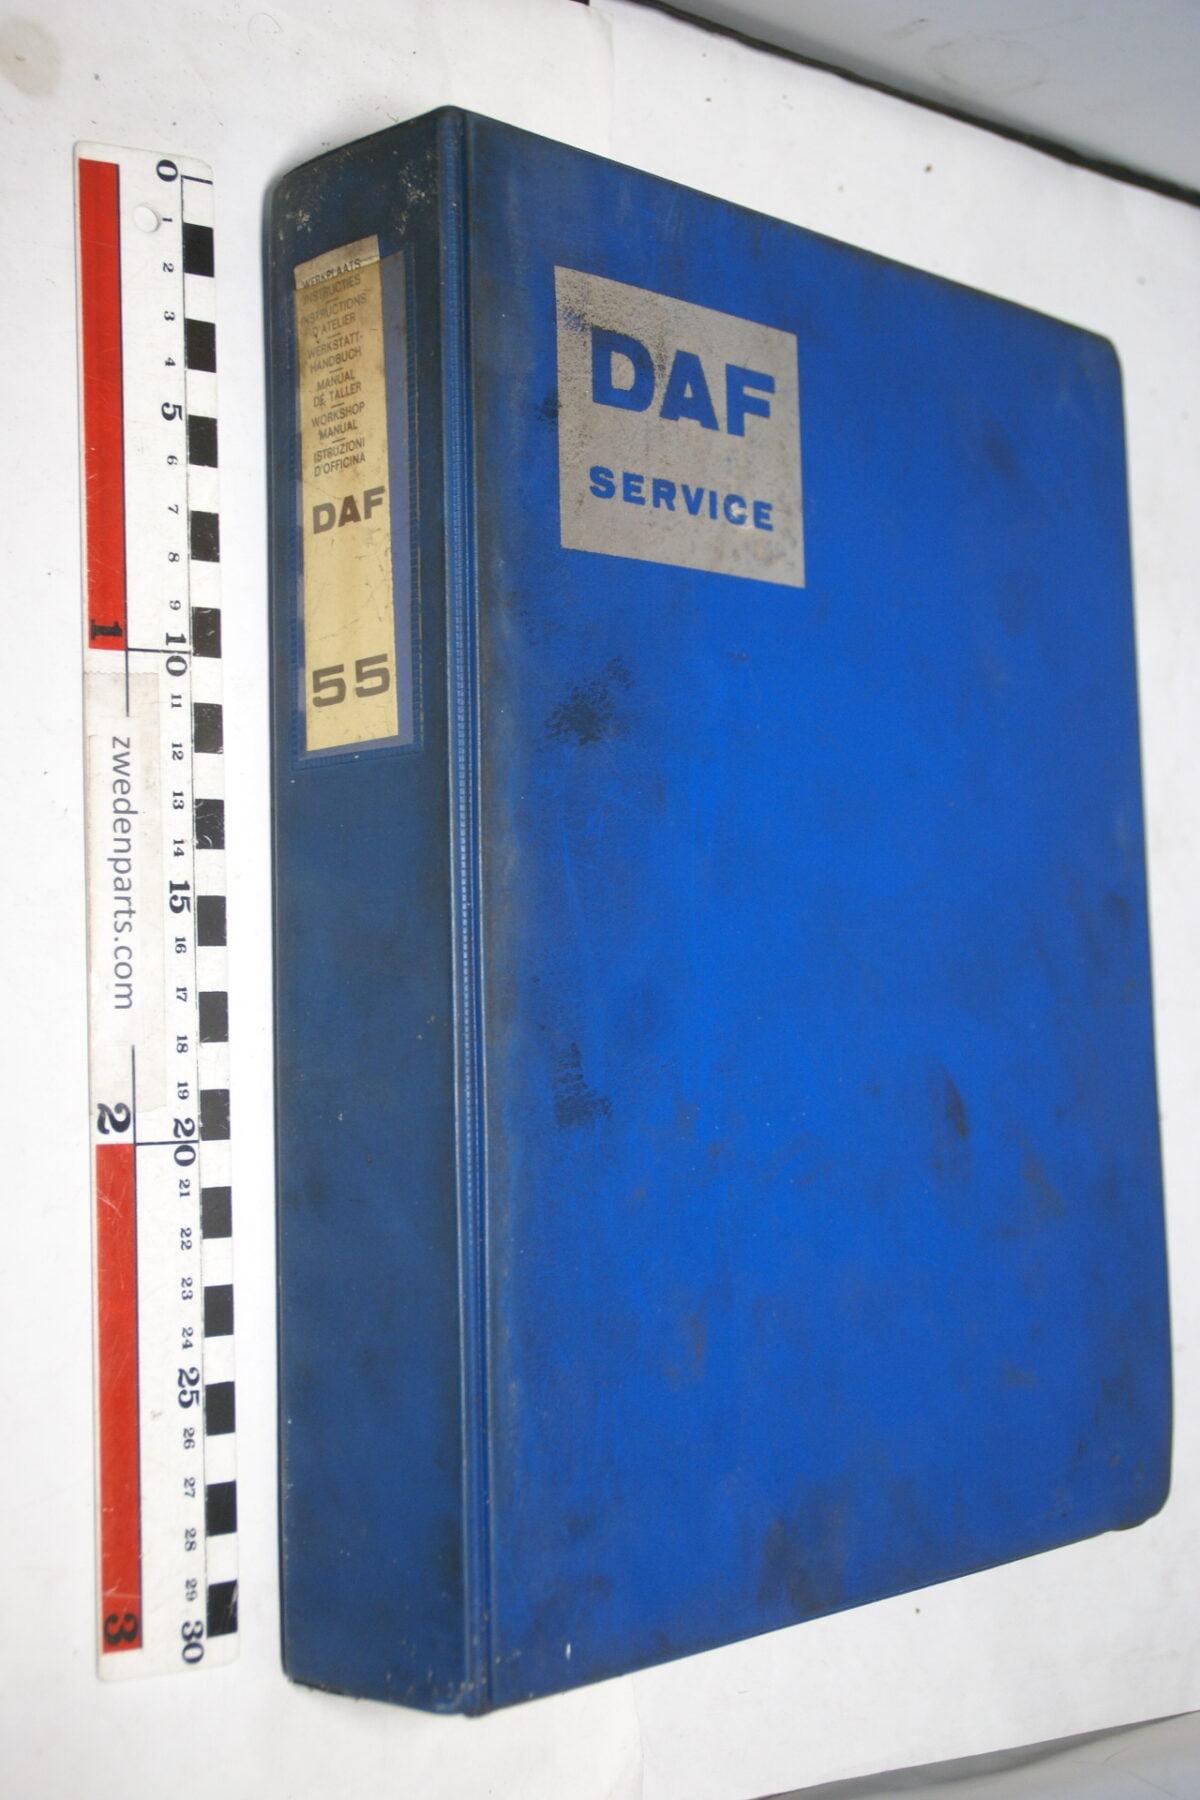 DSC01579 origineel DAF 55 werkplaatsboek-153e2d8a